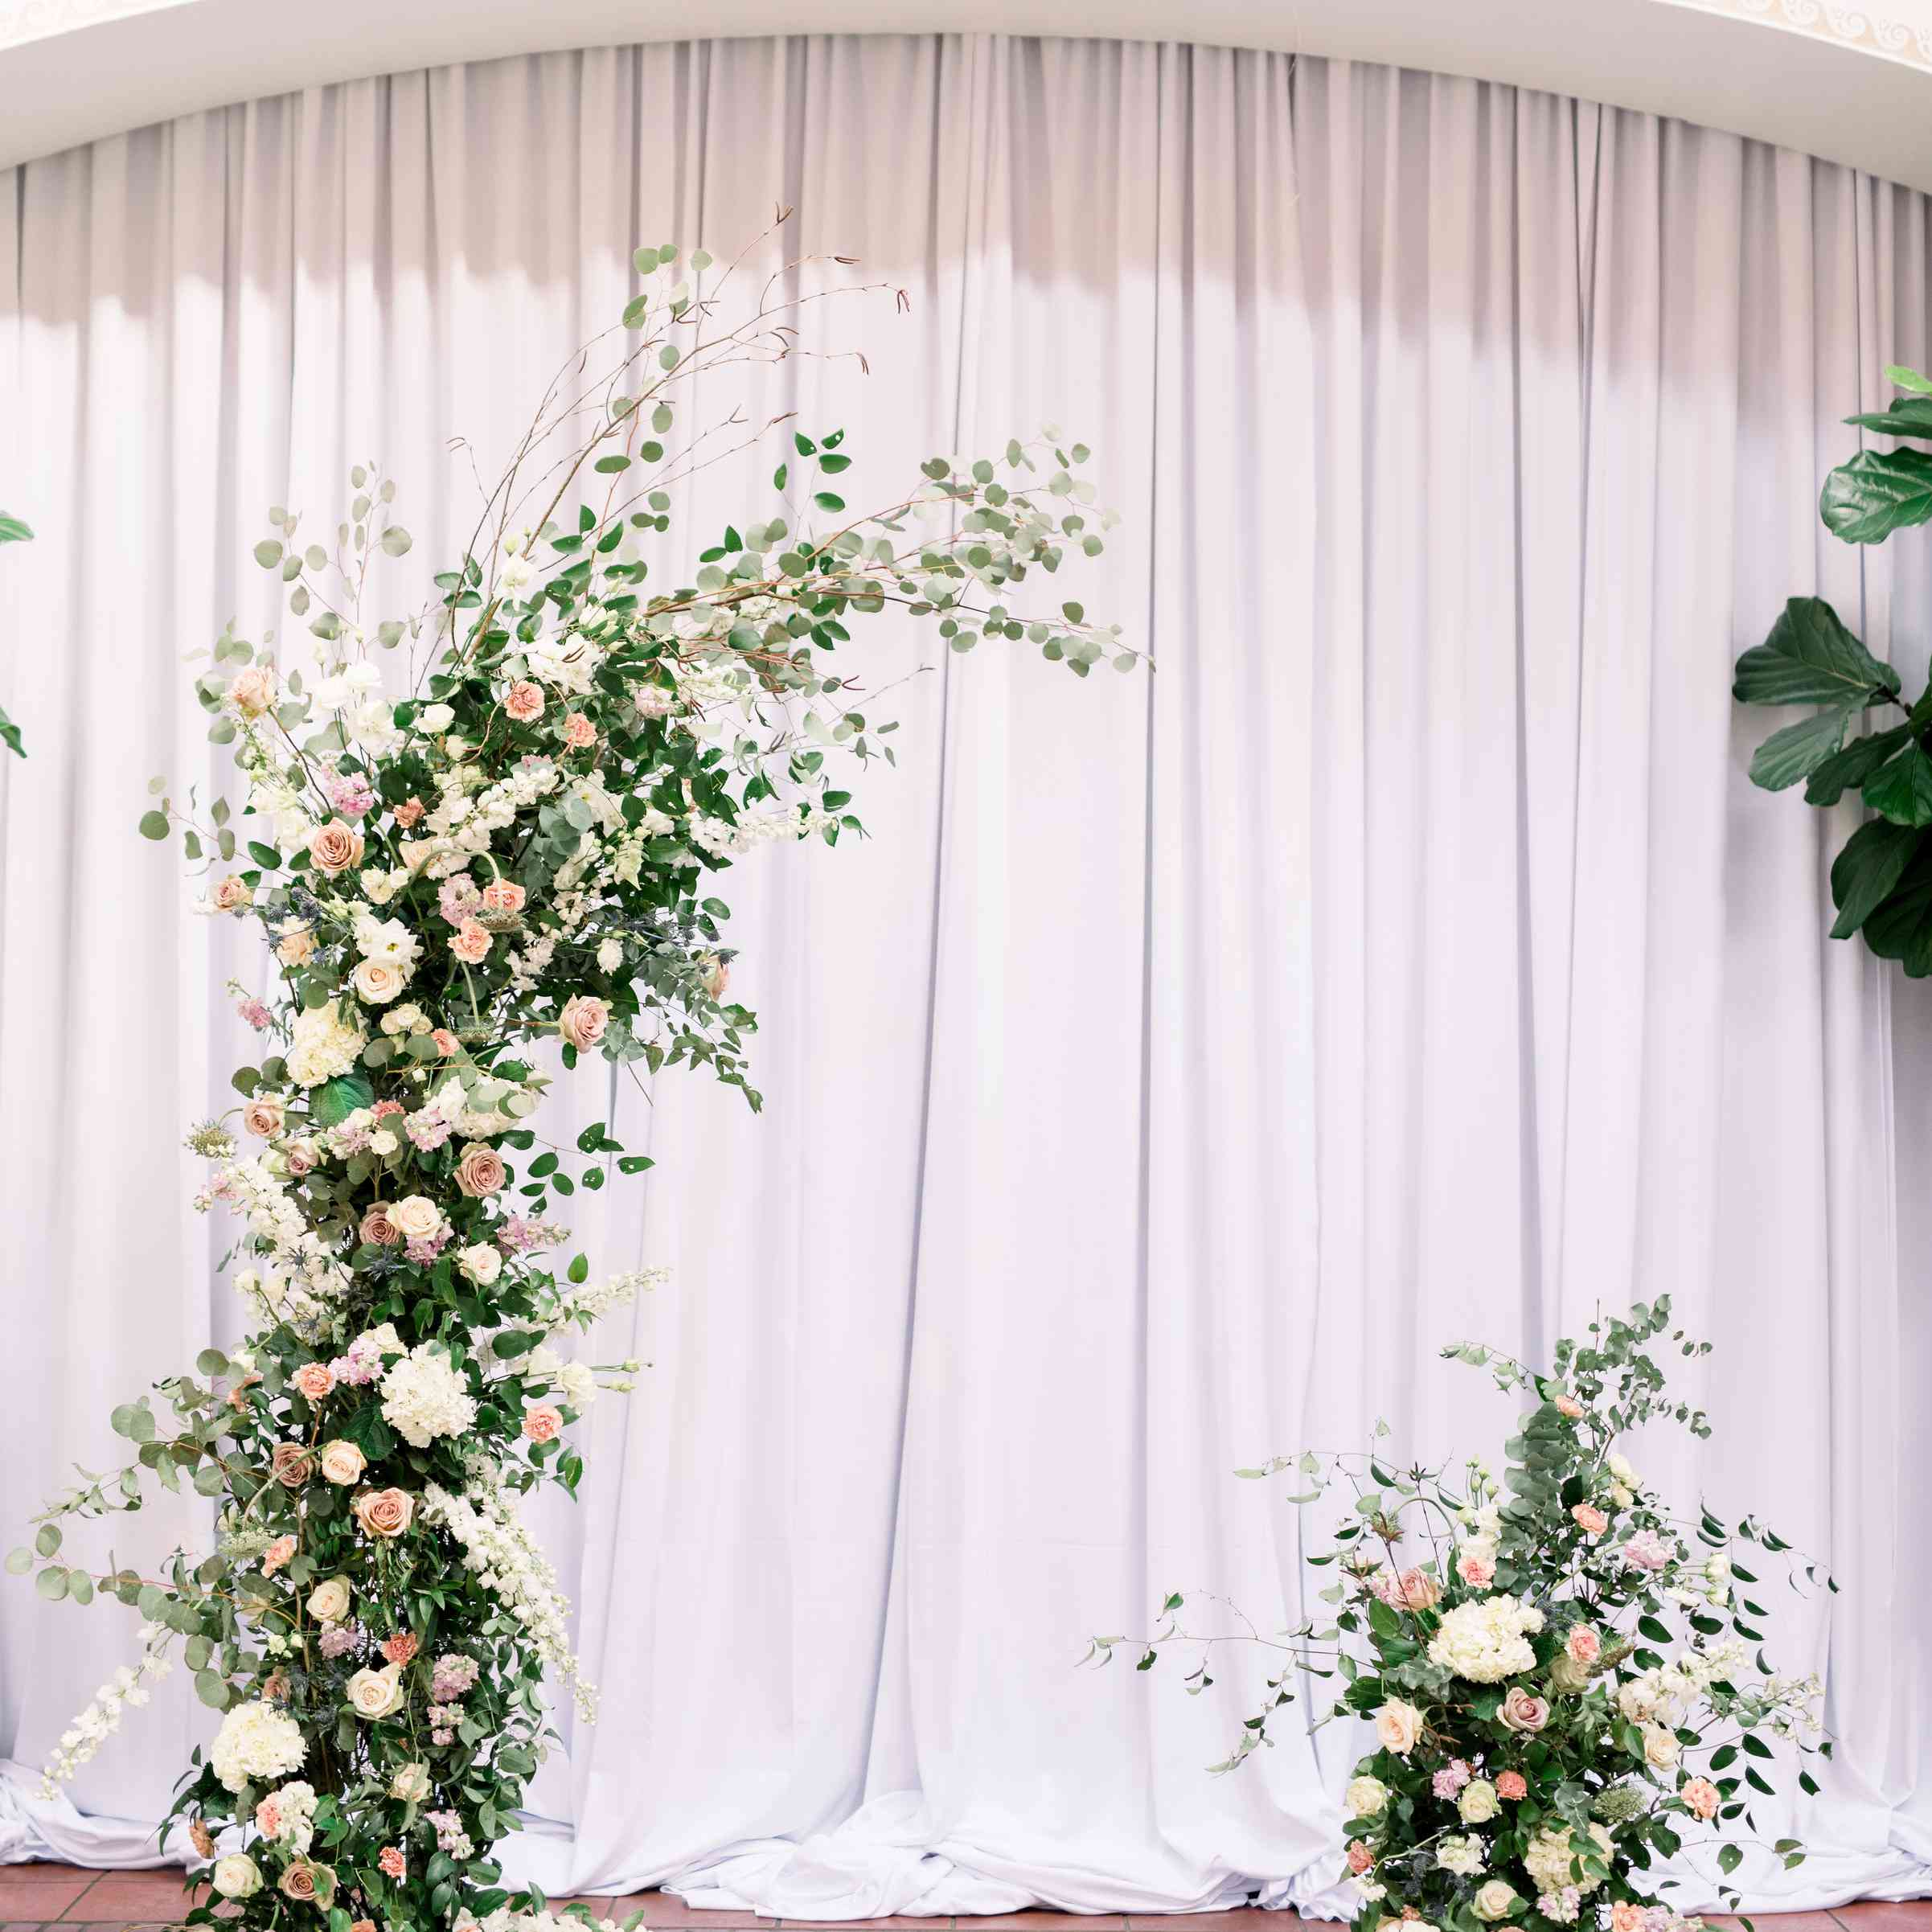 51 Stunning Wedding Arch And Arbor Ideas